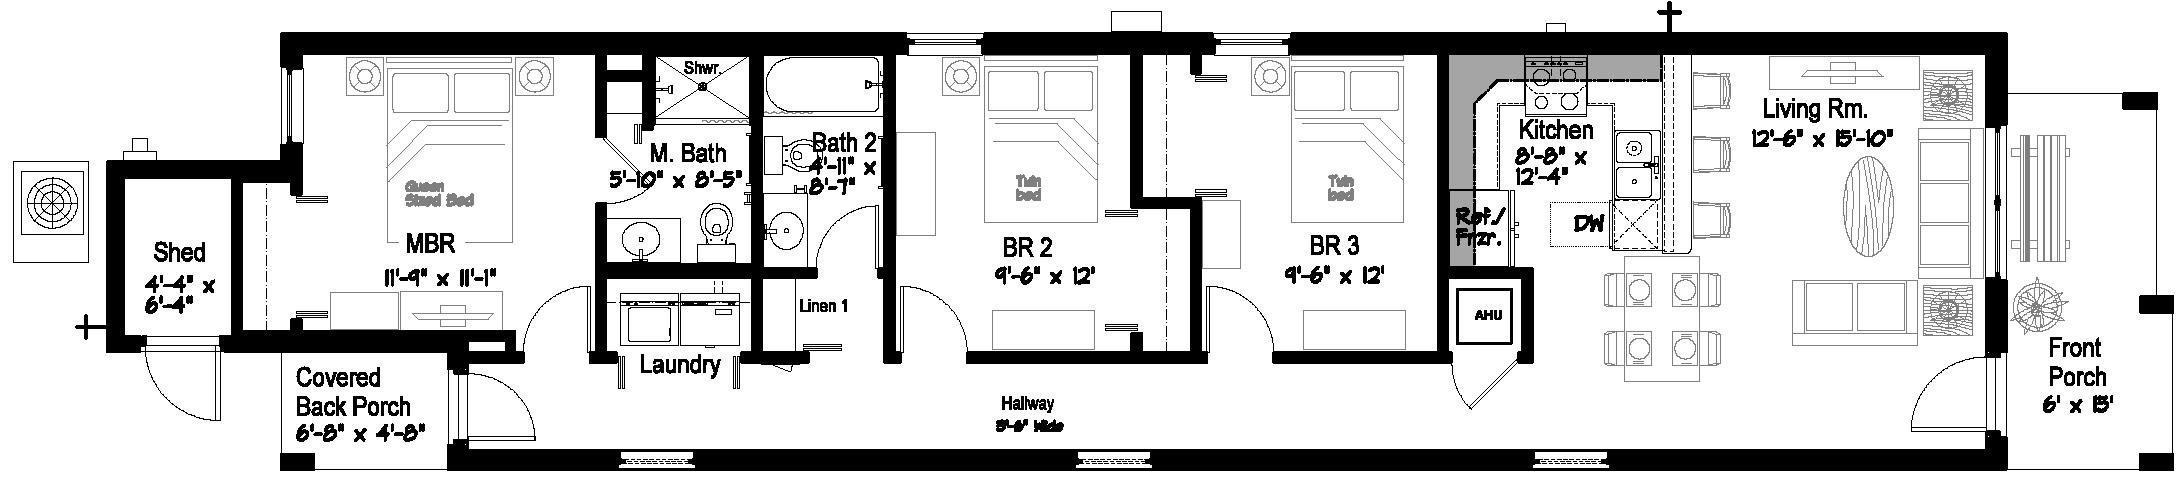 Habitat For Humanity Houses – David Porter Associates